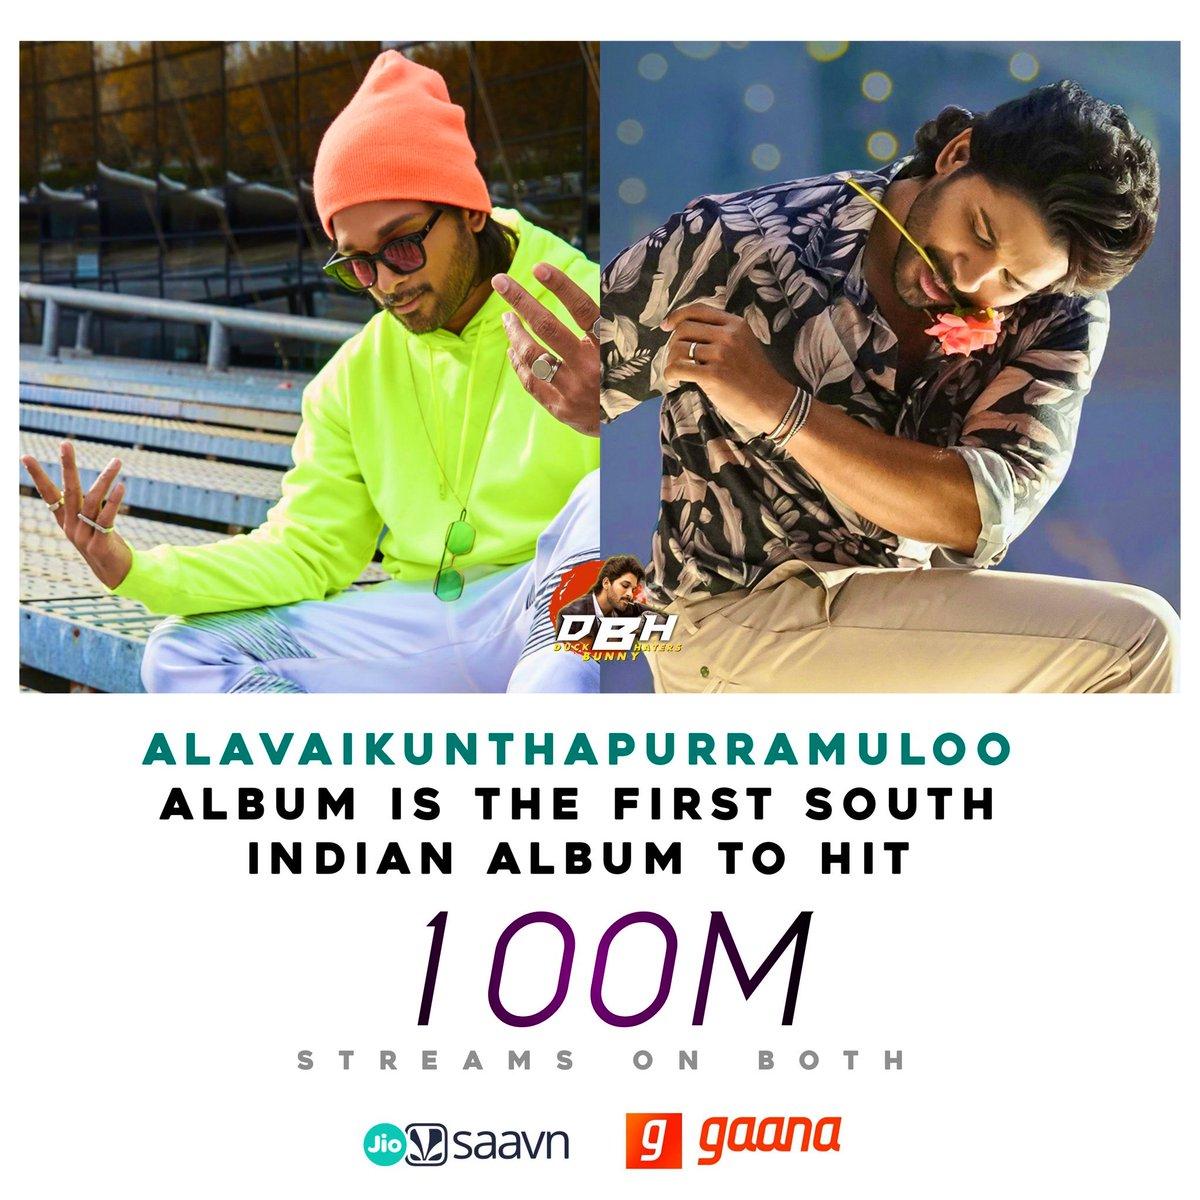 First South Indian album to achieve this feat #AVPLALBUM #avpl #AlaVaikunthapurramuloo ALBUM hits #100million in @JioSaavn @gaana ✊♥️